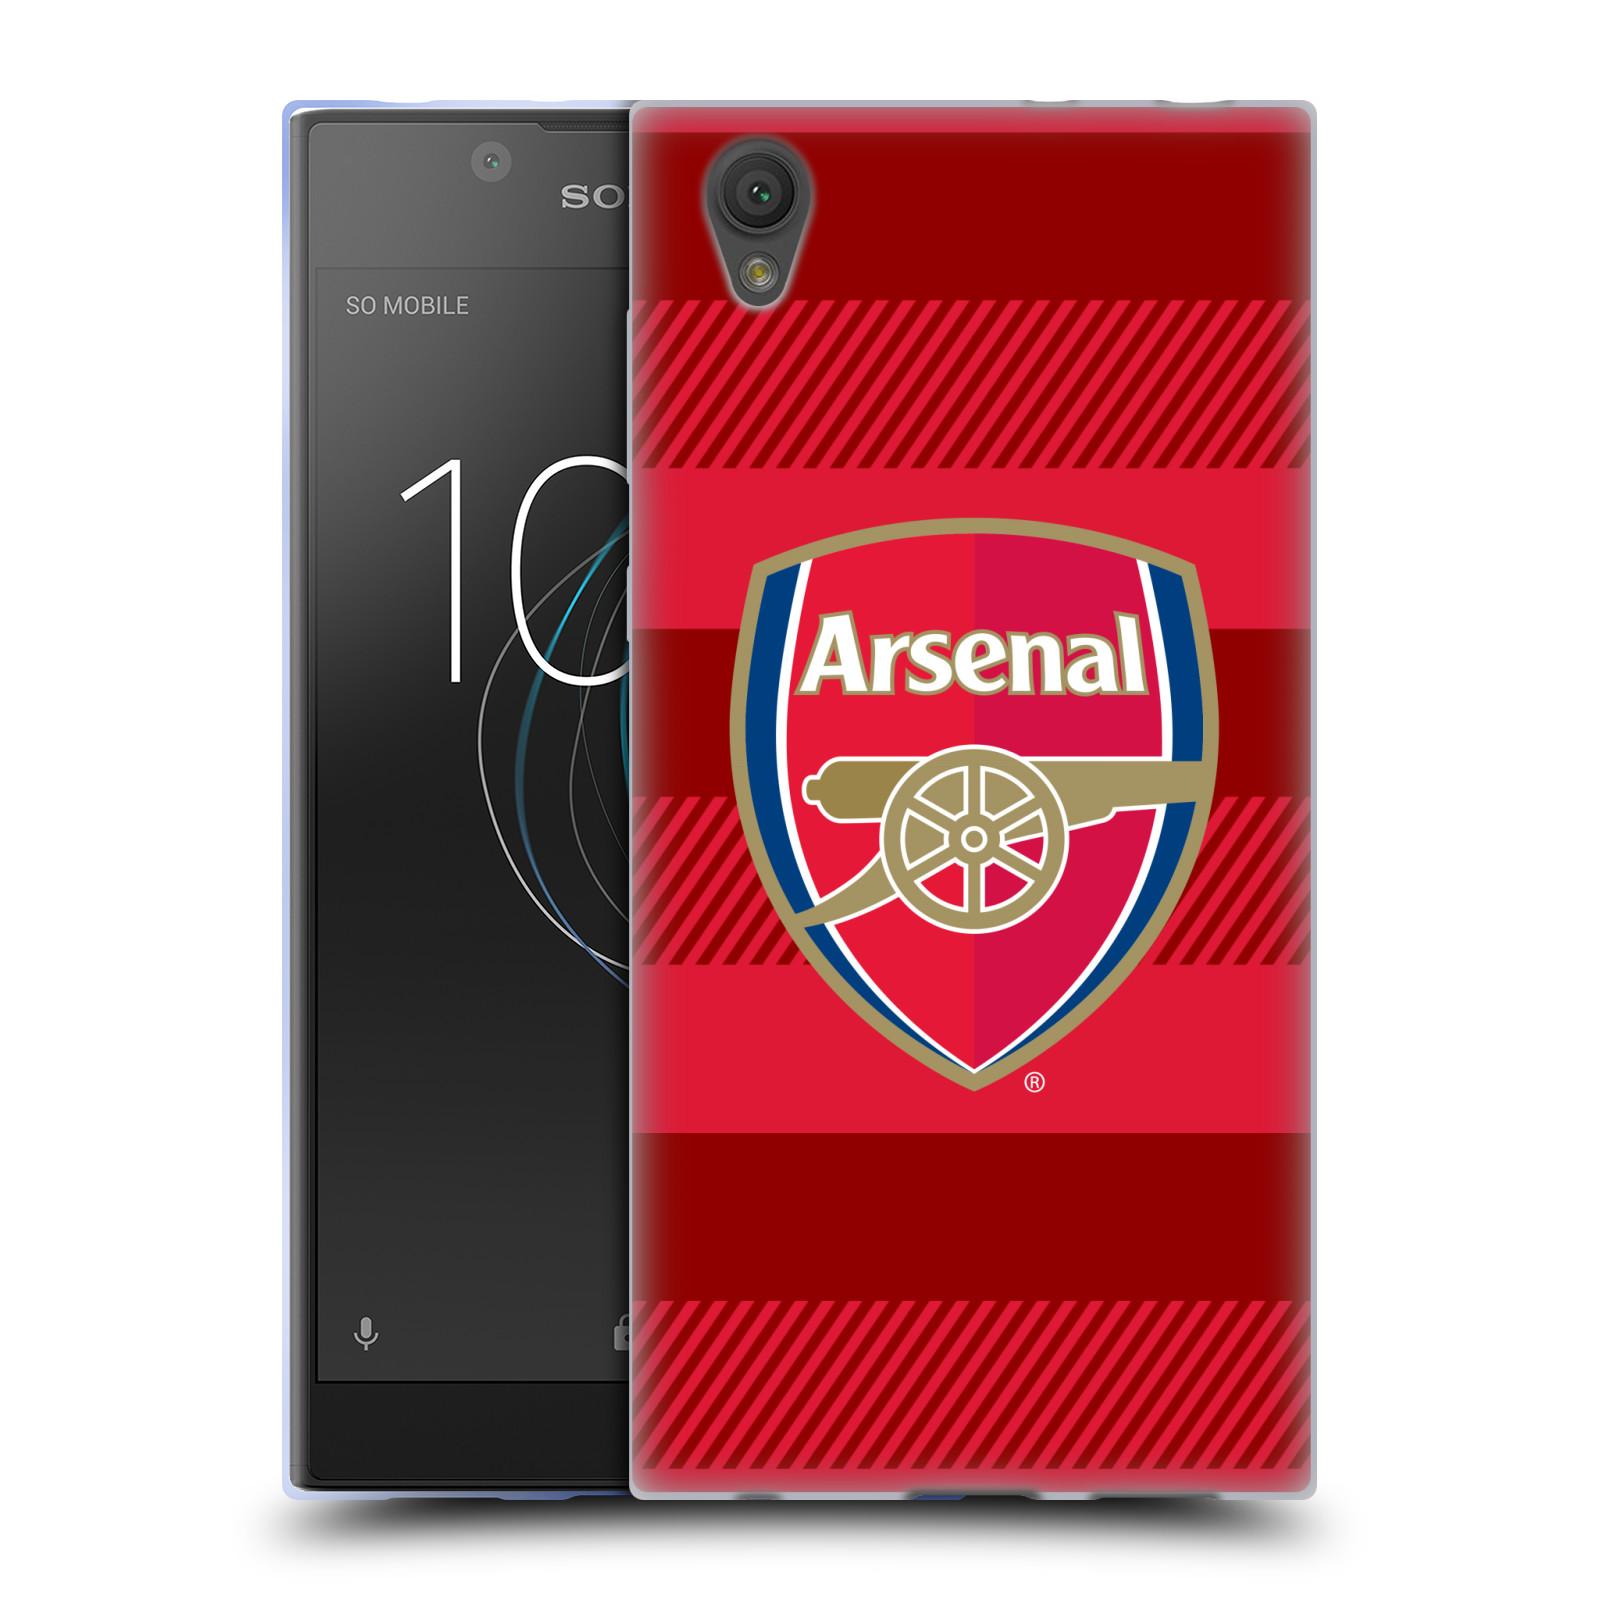 Silikonové pouzdro na mobil Sony Xperia L1 - Head Case - Arsenal FC - Logo s pruhy